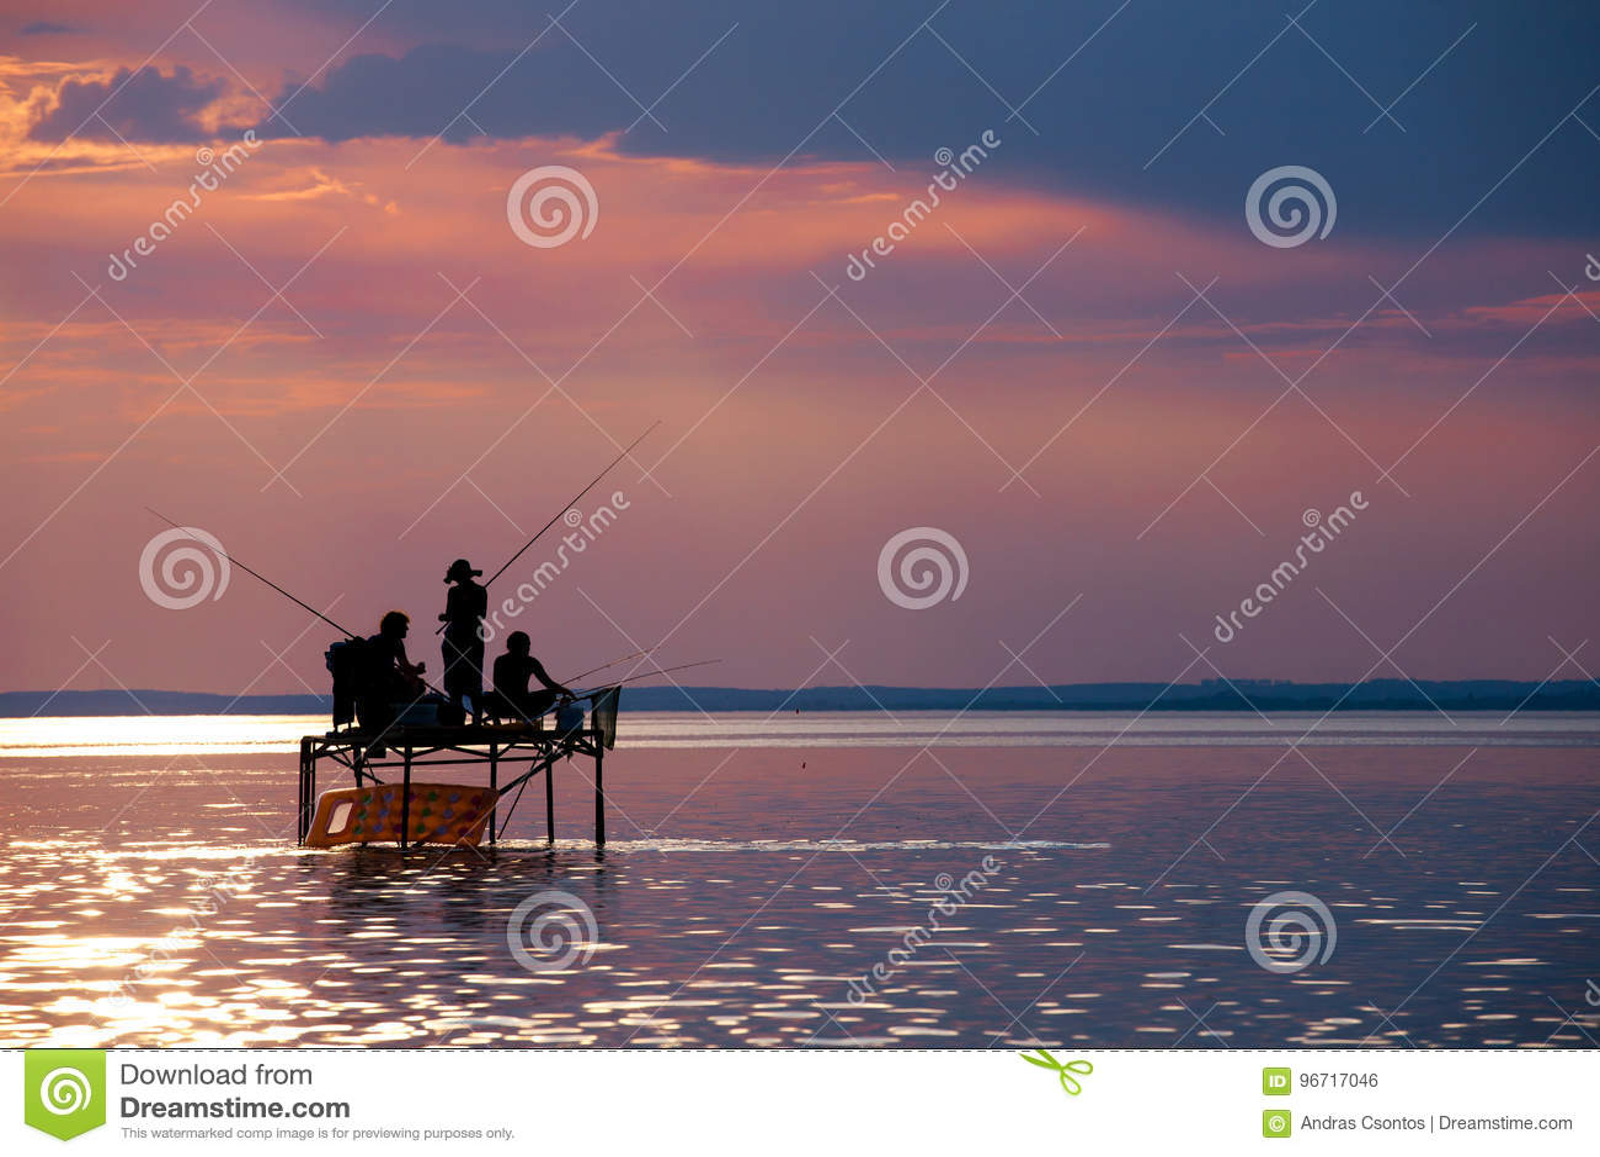 Anglers` silhouettes on a fishing stand at sunset at Lake Balat